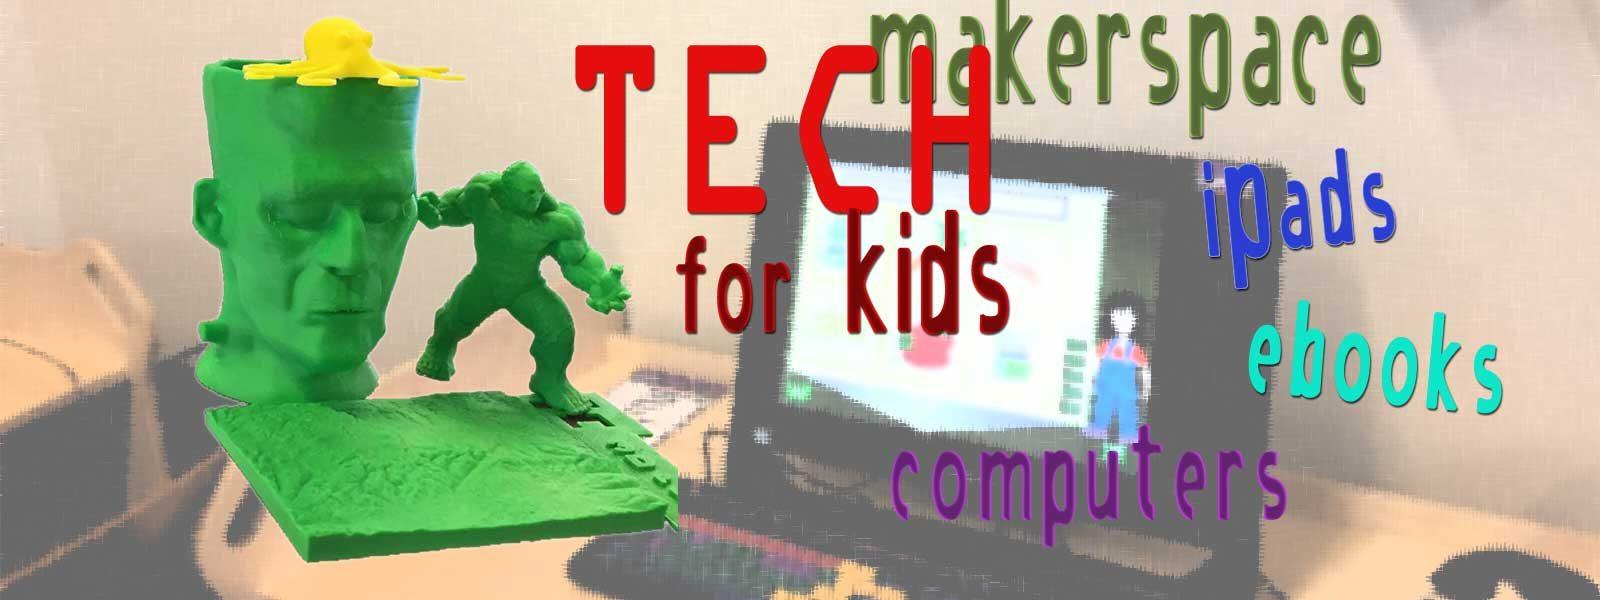 Tech-for-kids-2